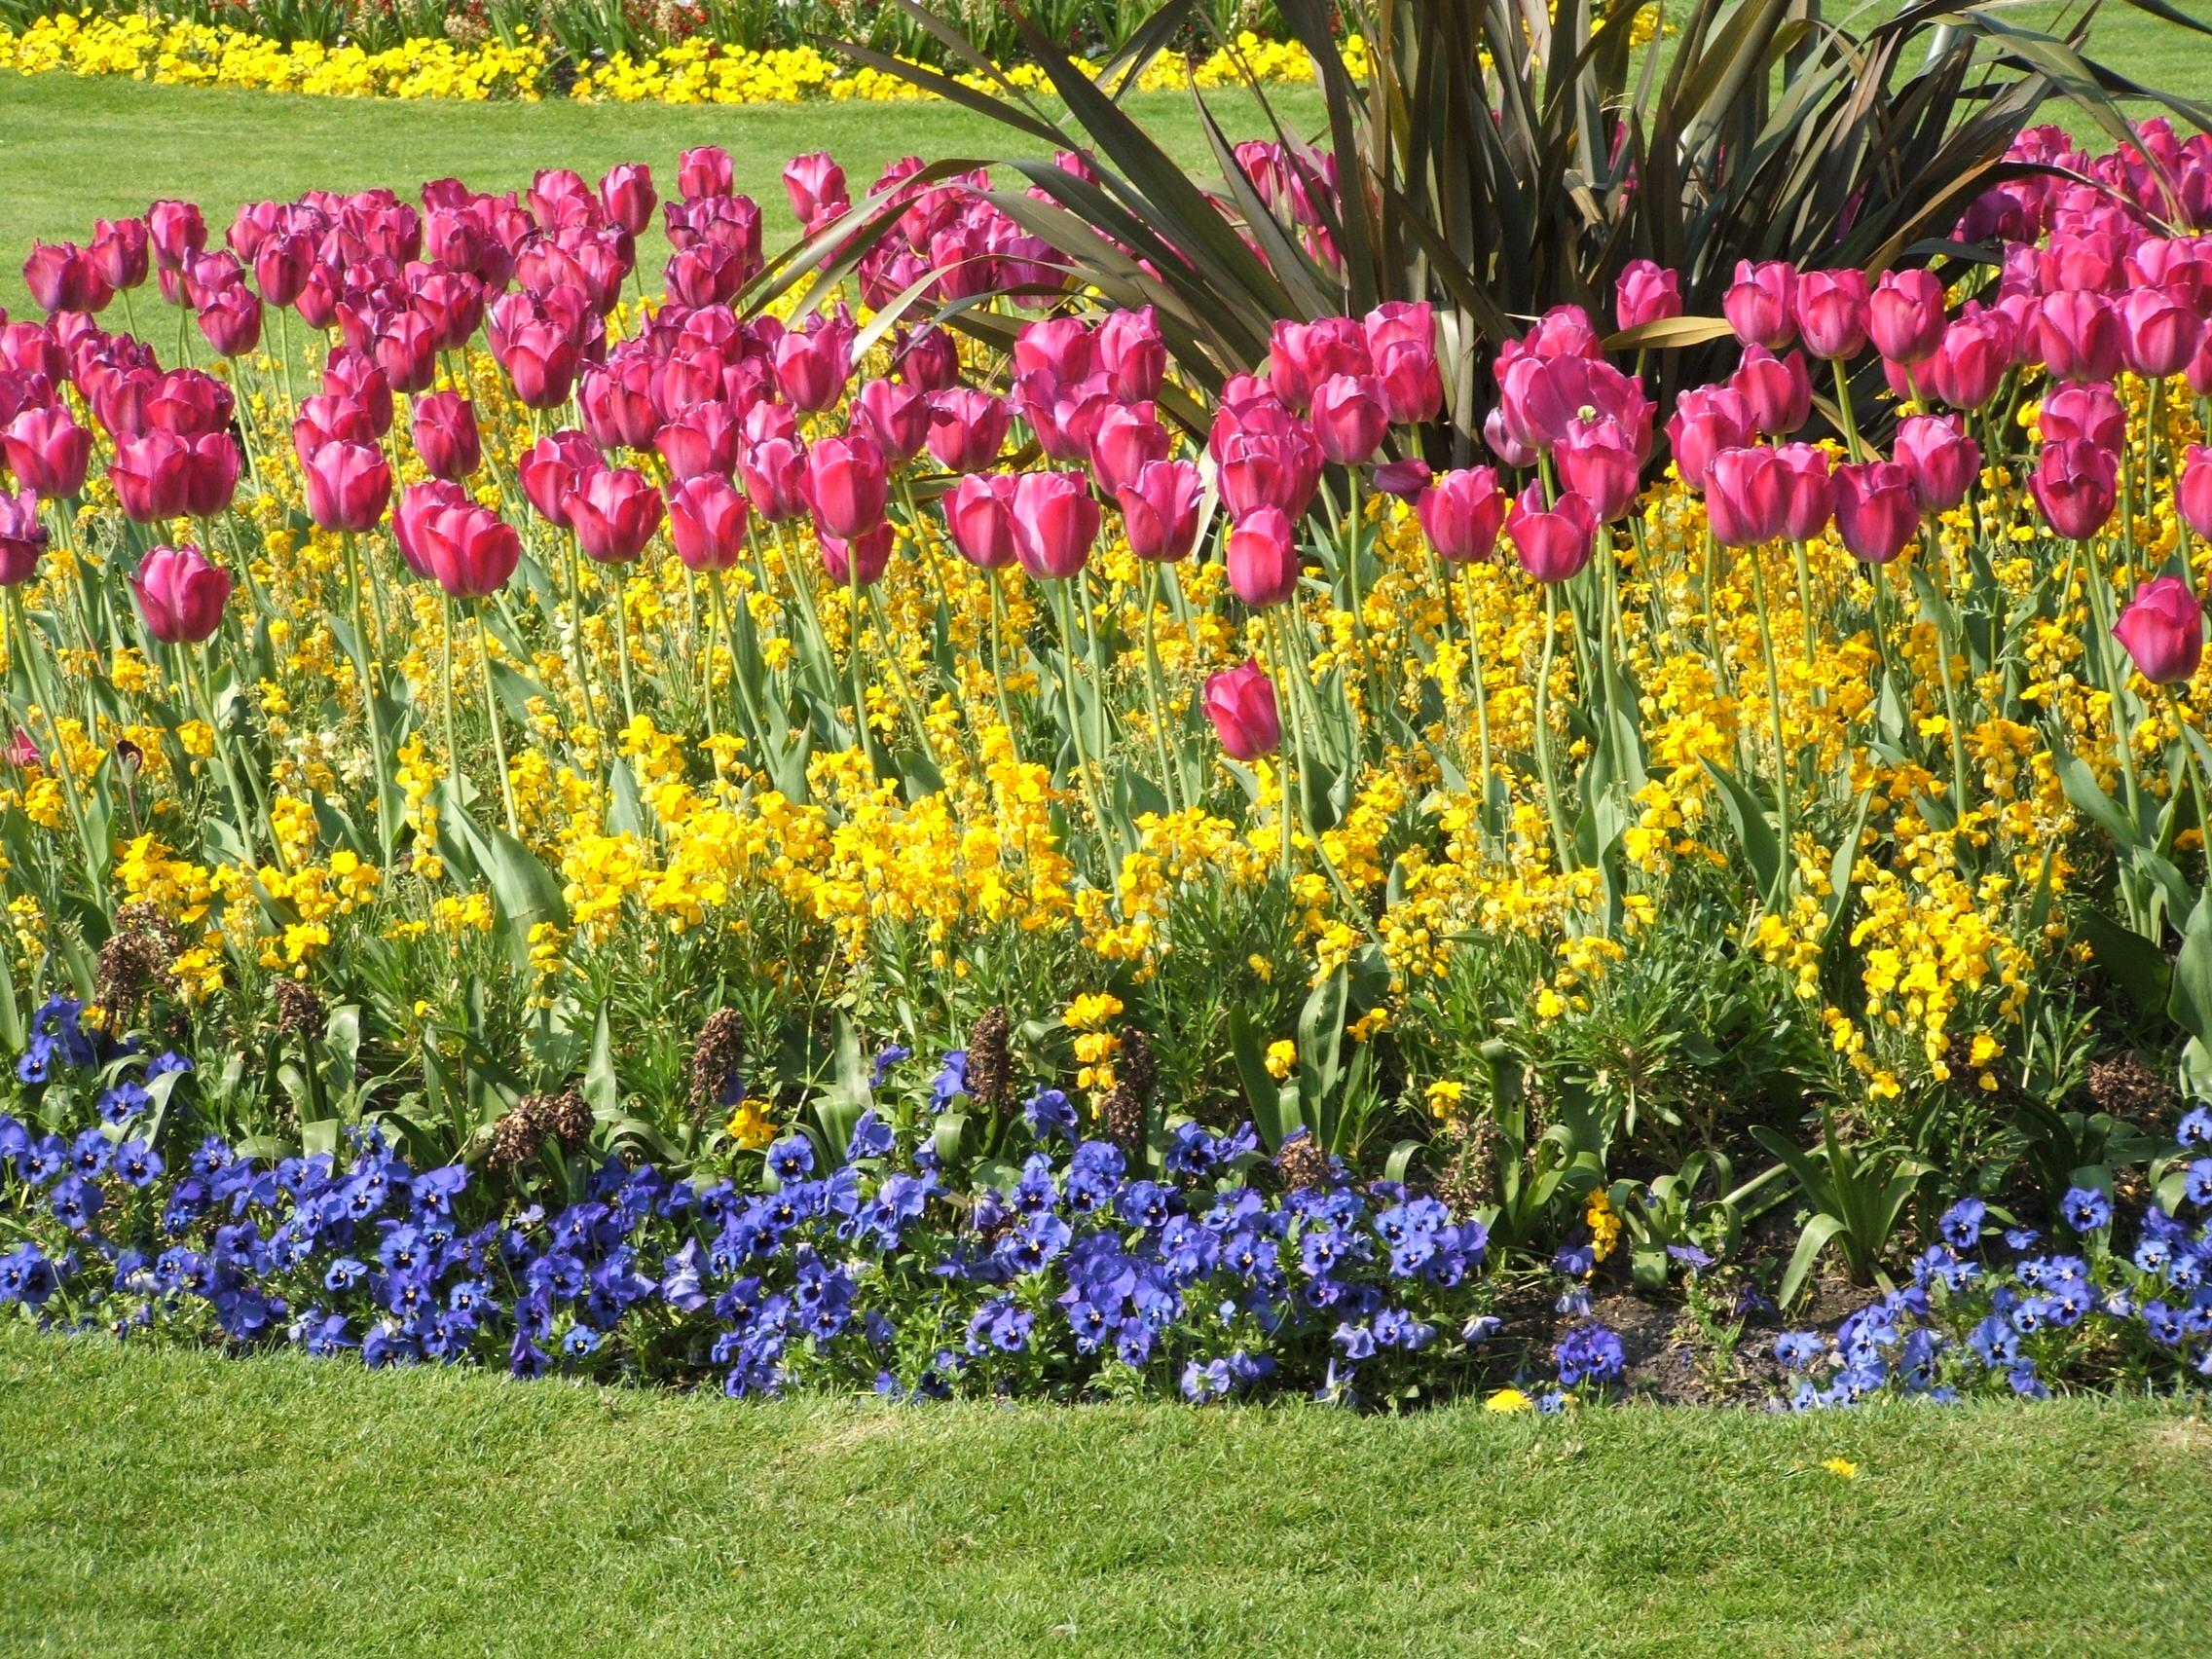 Crea tu jard n hazi jardineria for Crea tu jardin